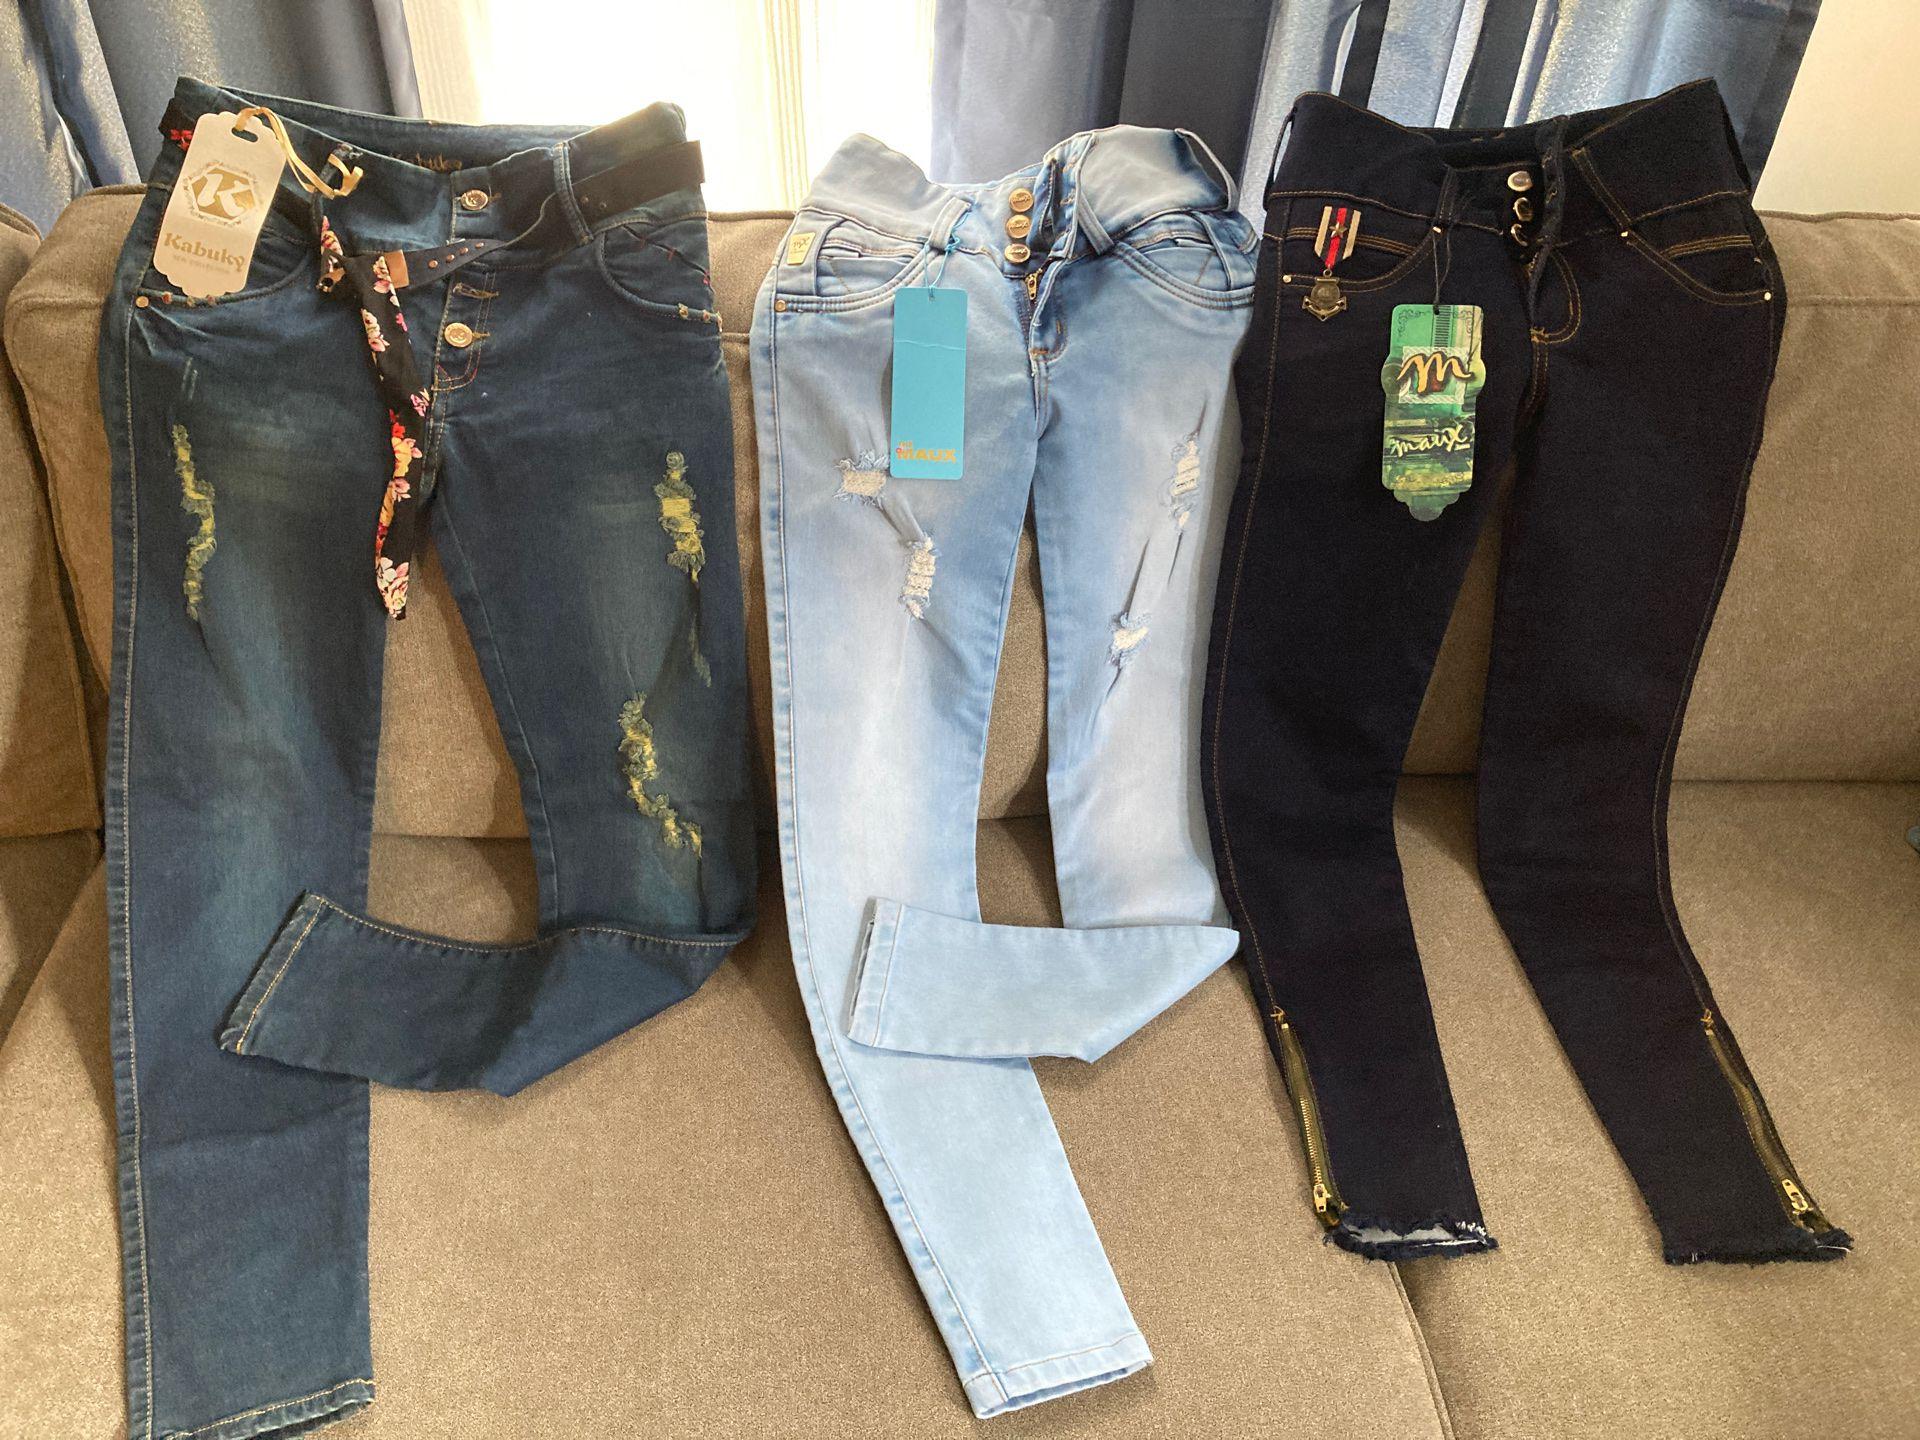 Lift butt 100% Colombian Jeans size 10